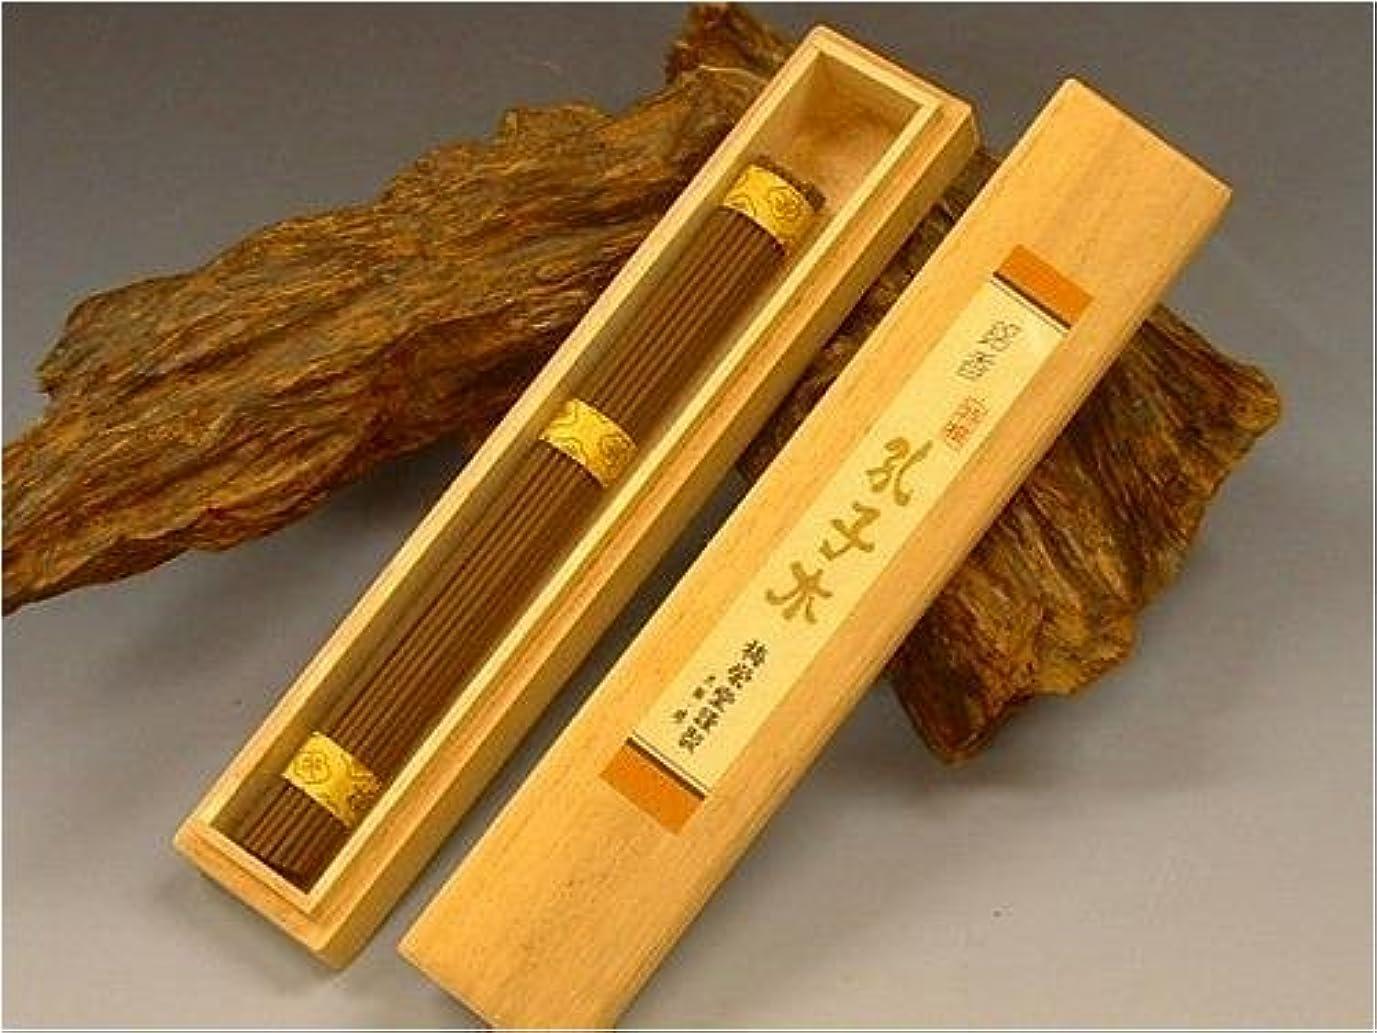 超越する木弾丸特撰孔子木 中寸1把入り上桐箱